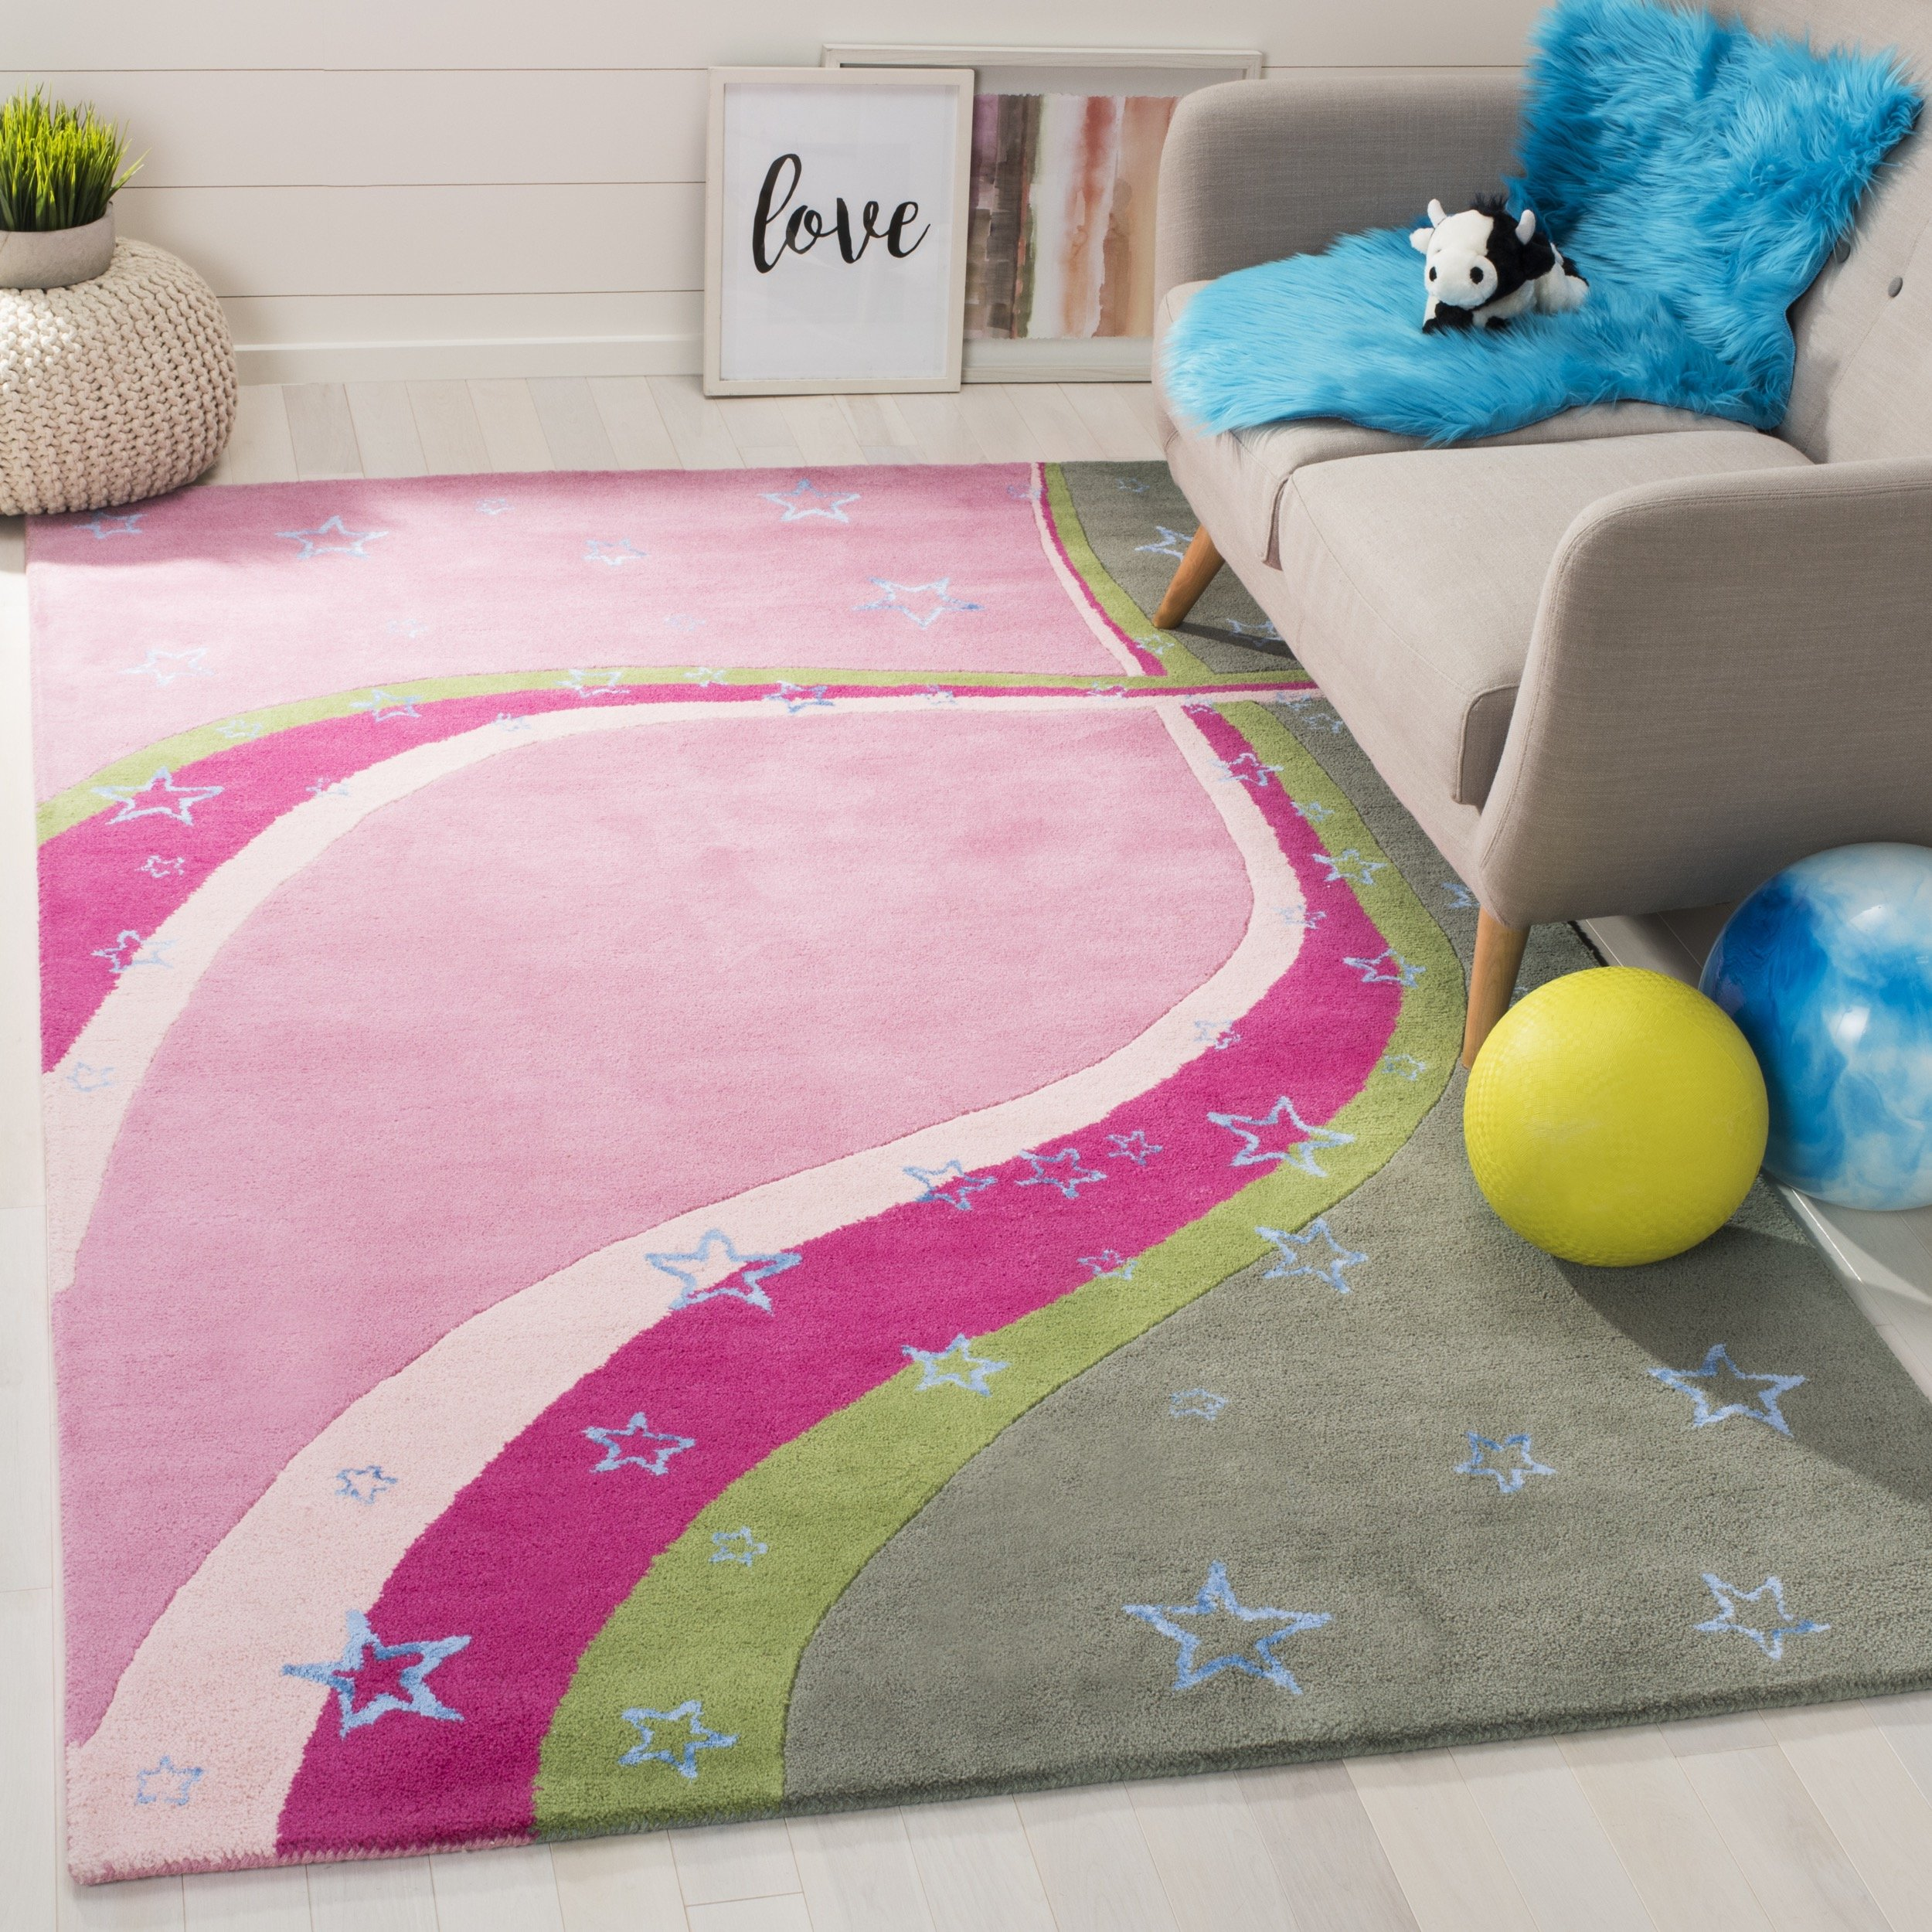 Safavieh Safavieh Kids Collection SFK338A Handmade Green and Pink Cotton Area Rug (6' x 9')